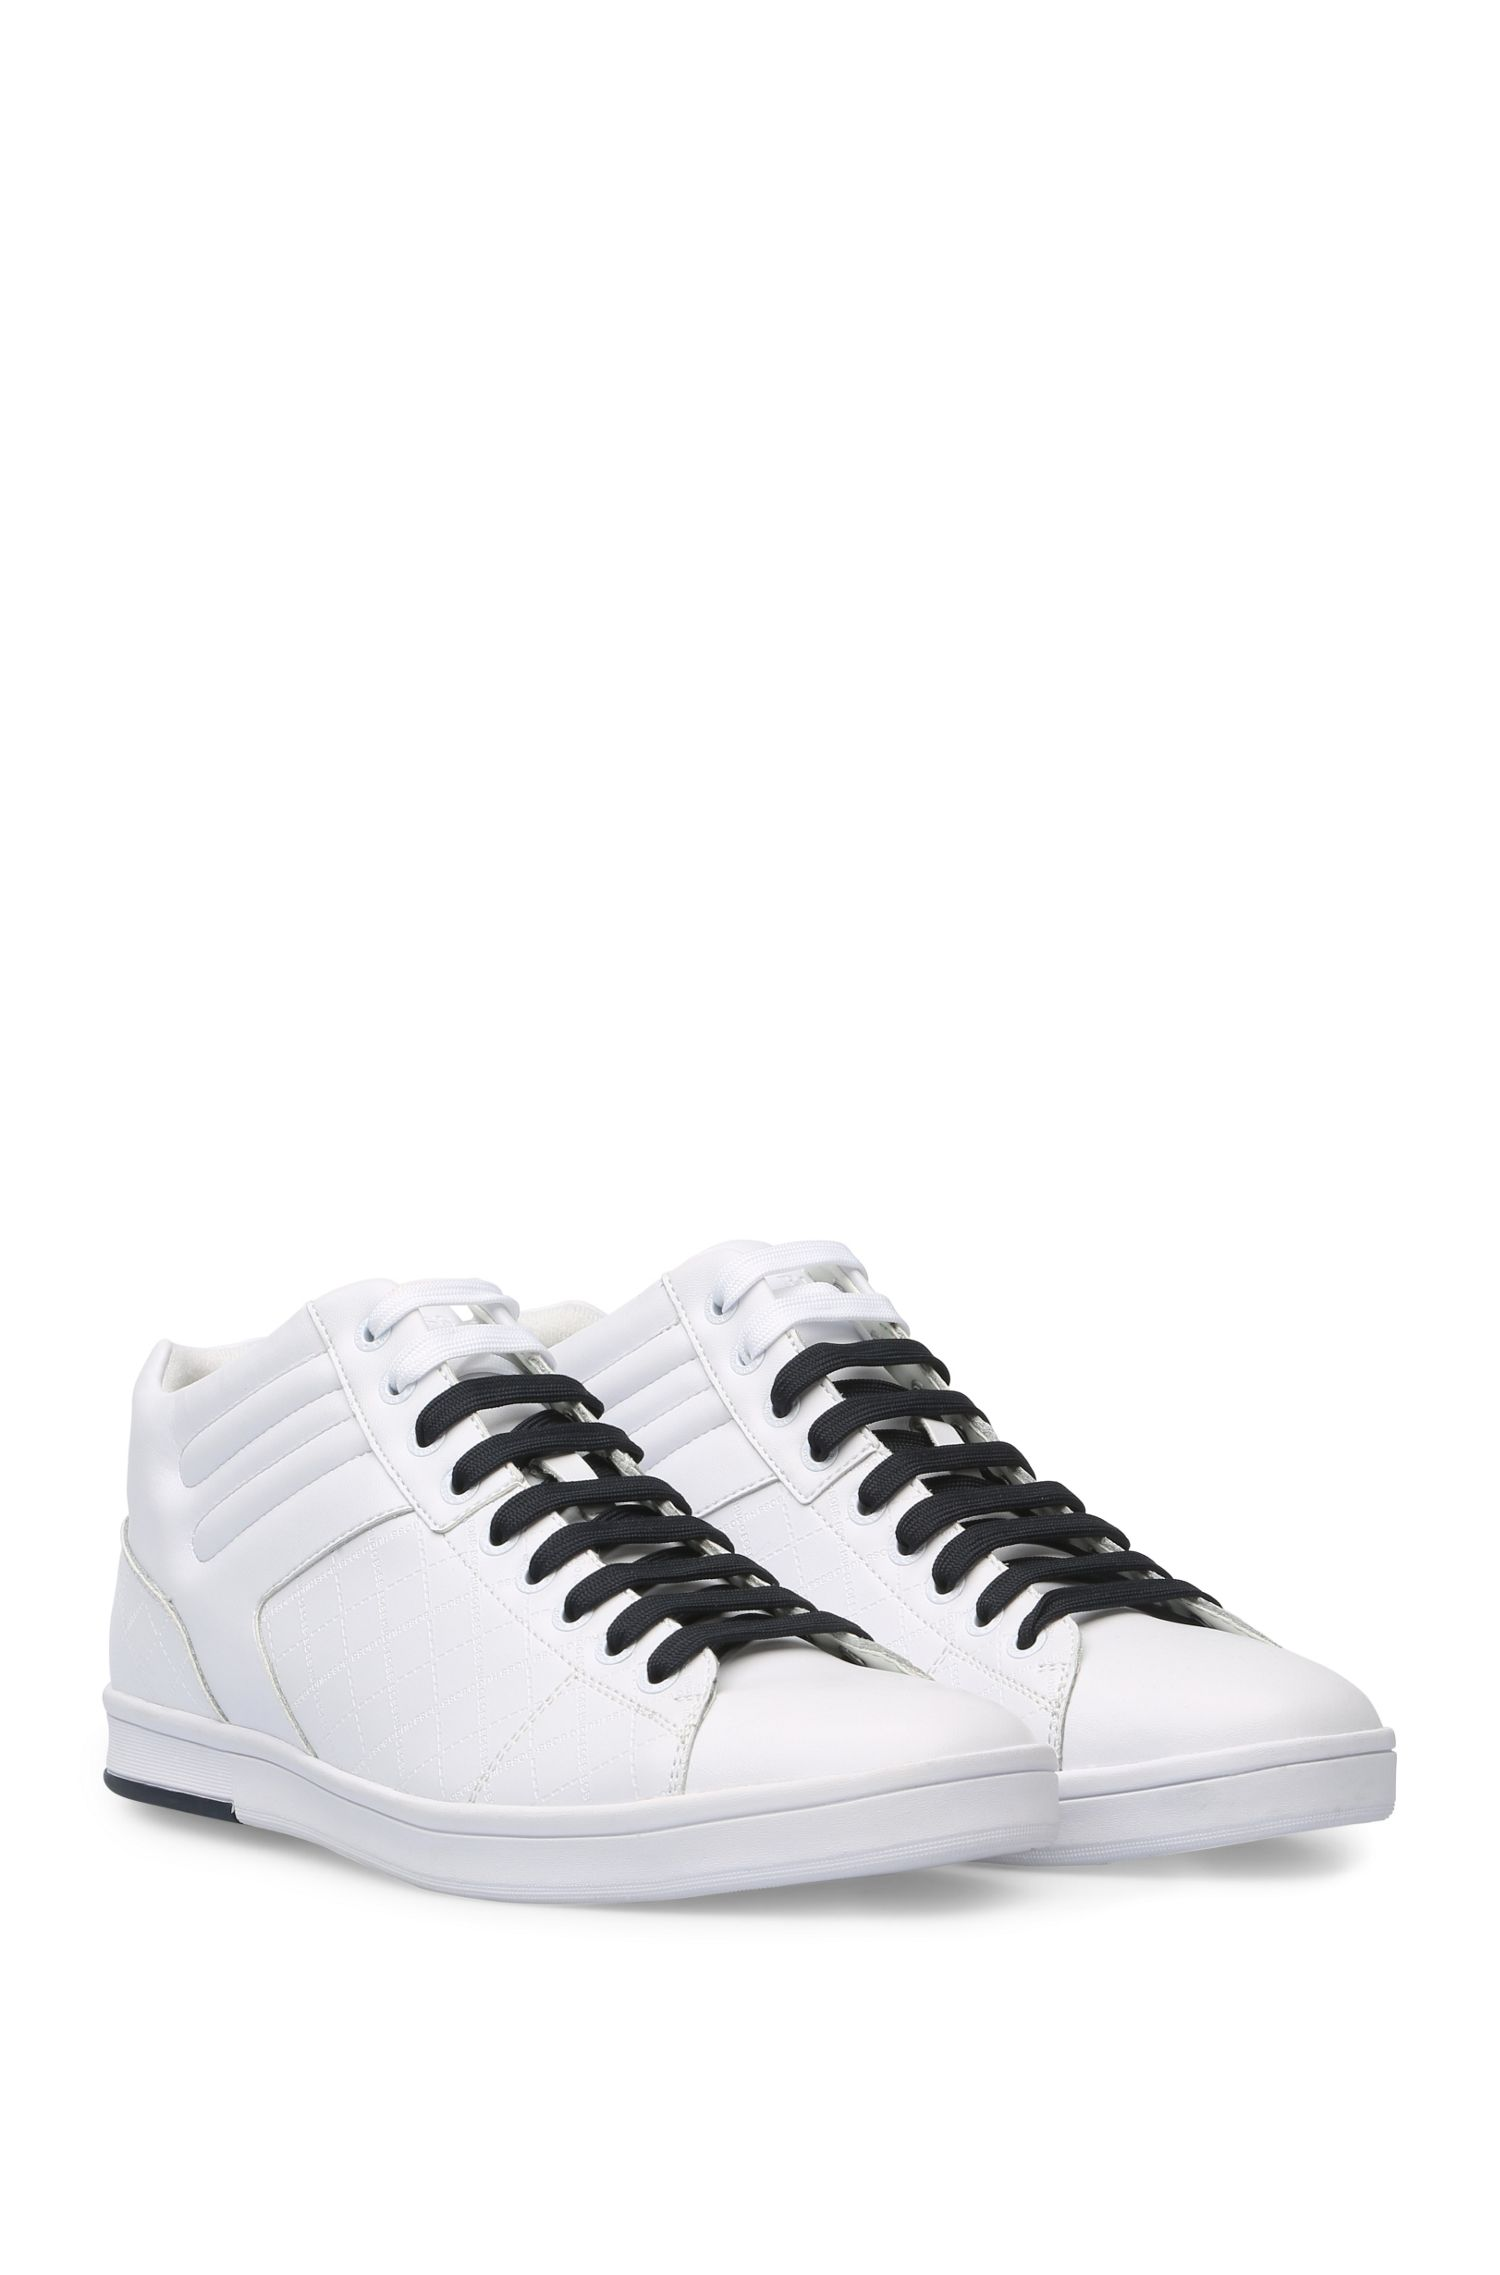 Leren sneakers met ingestanst logo: 'RayAdv_Midc_ltem'